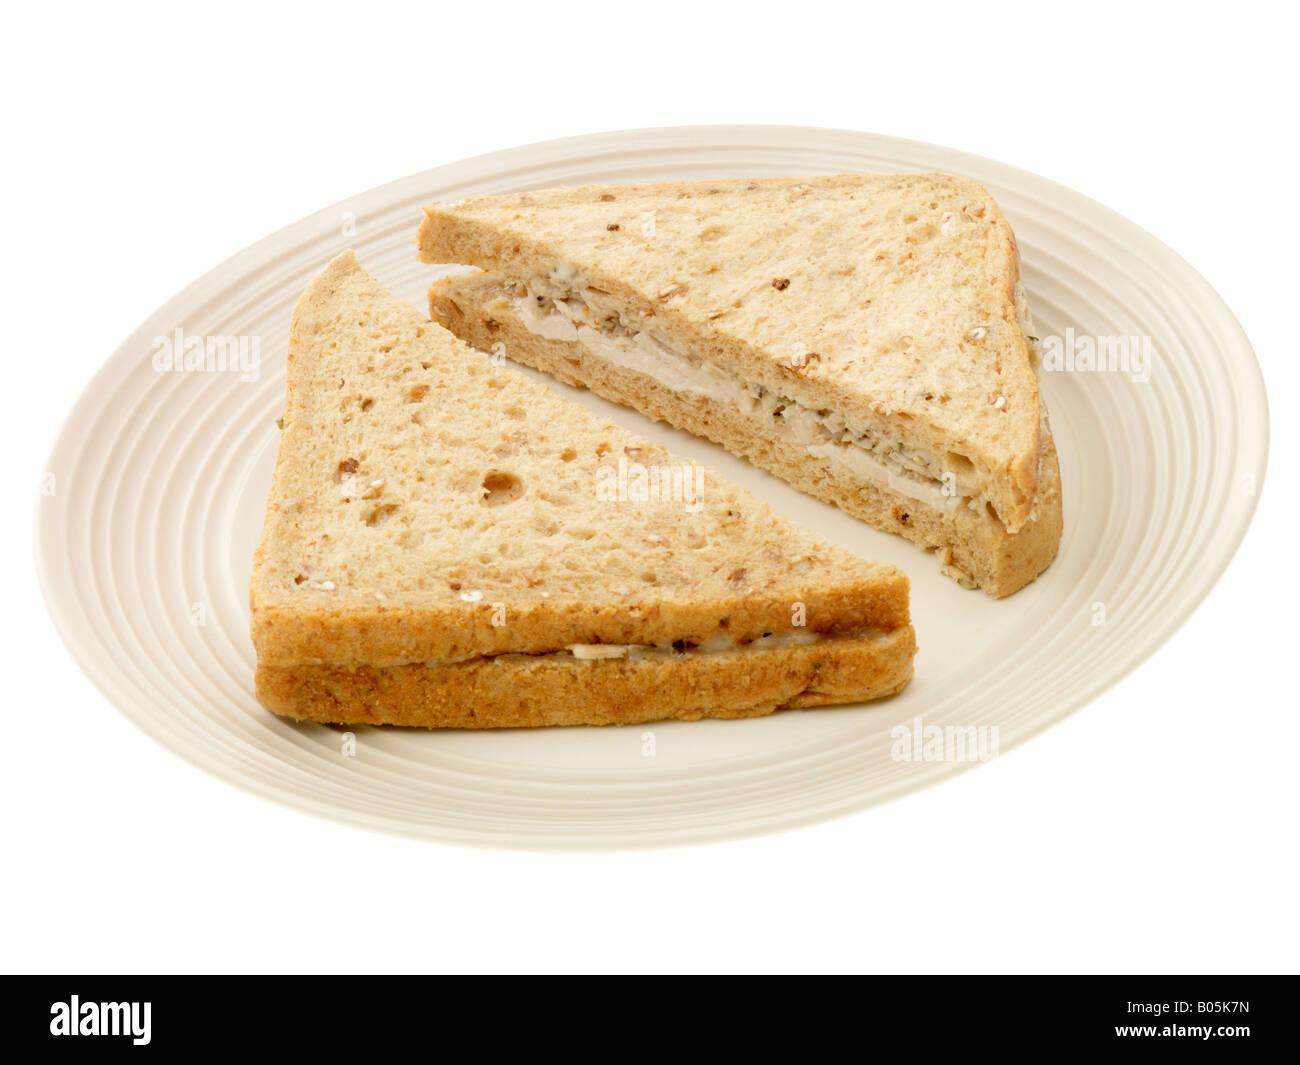 Roast Chicken And Stuffing Sandwich - Stock Image